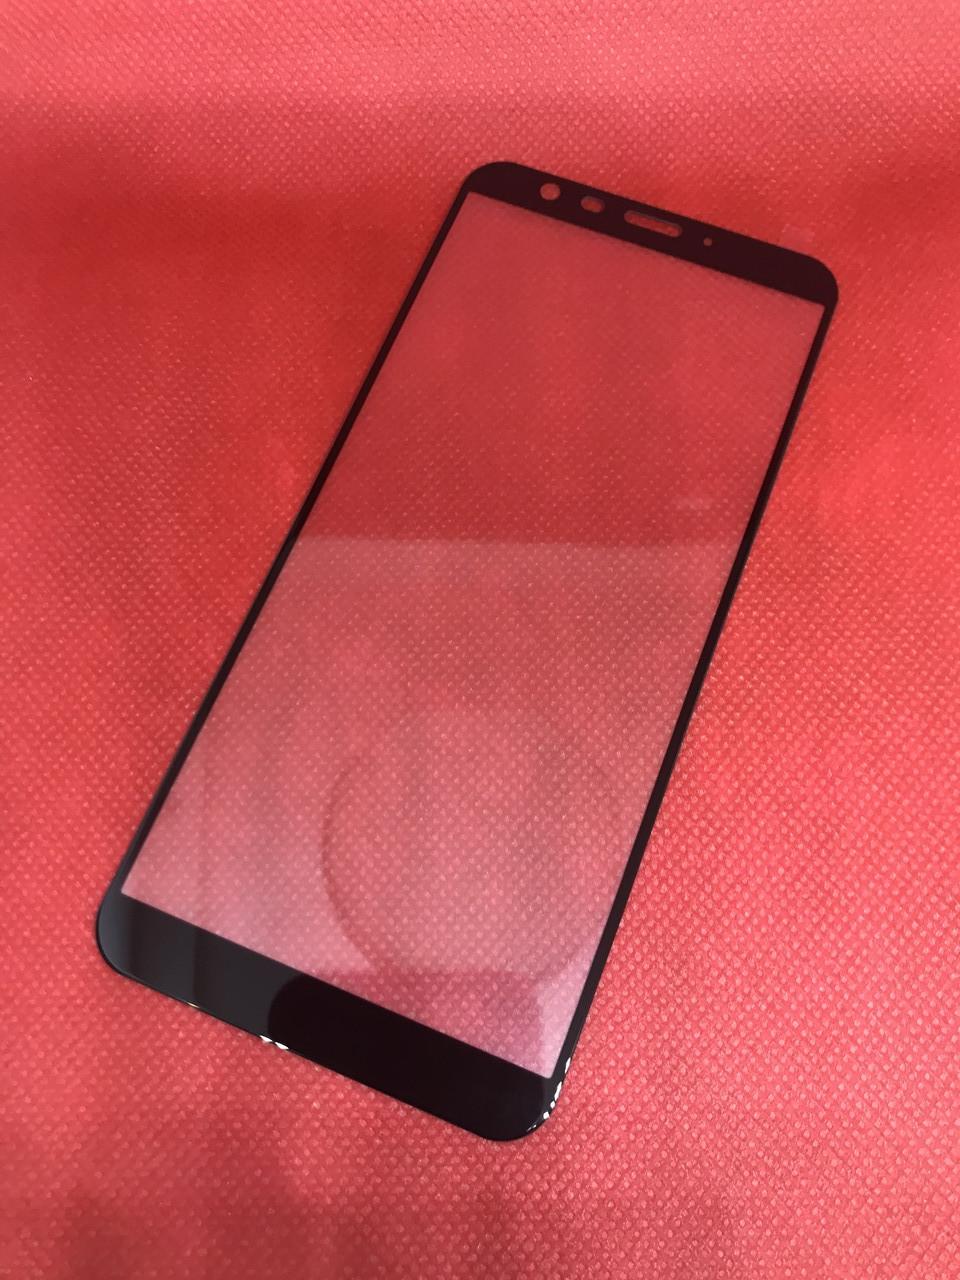 Meizu M8C защитное 2,5D 3D стекло Full Cover (черная окантовка) полное покрытие